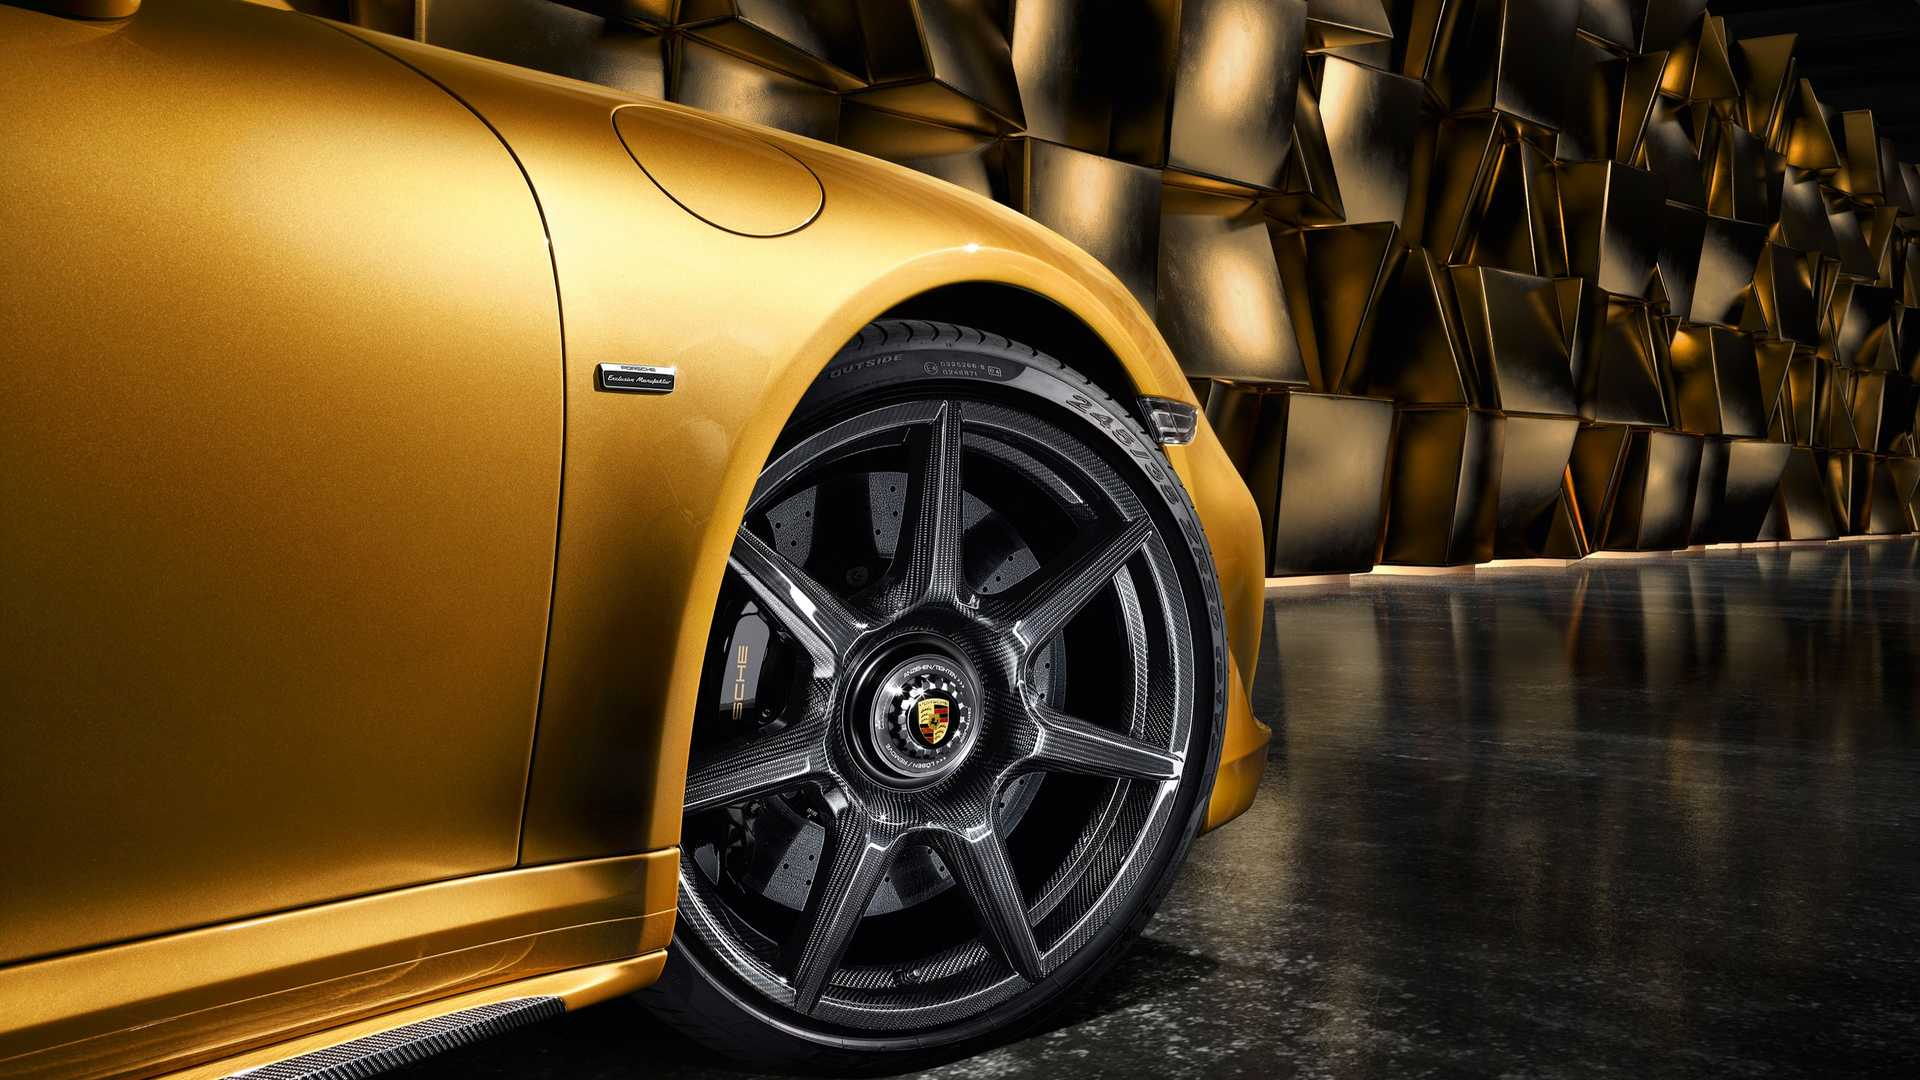 Porsche Goes Full OCD On How Its Wheel Center Caps Are Aligned